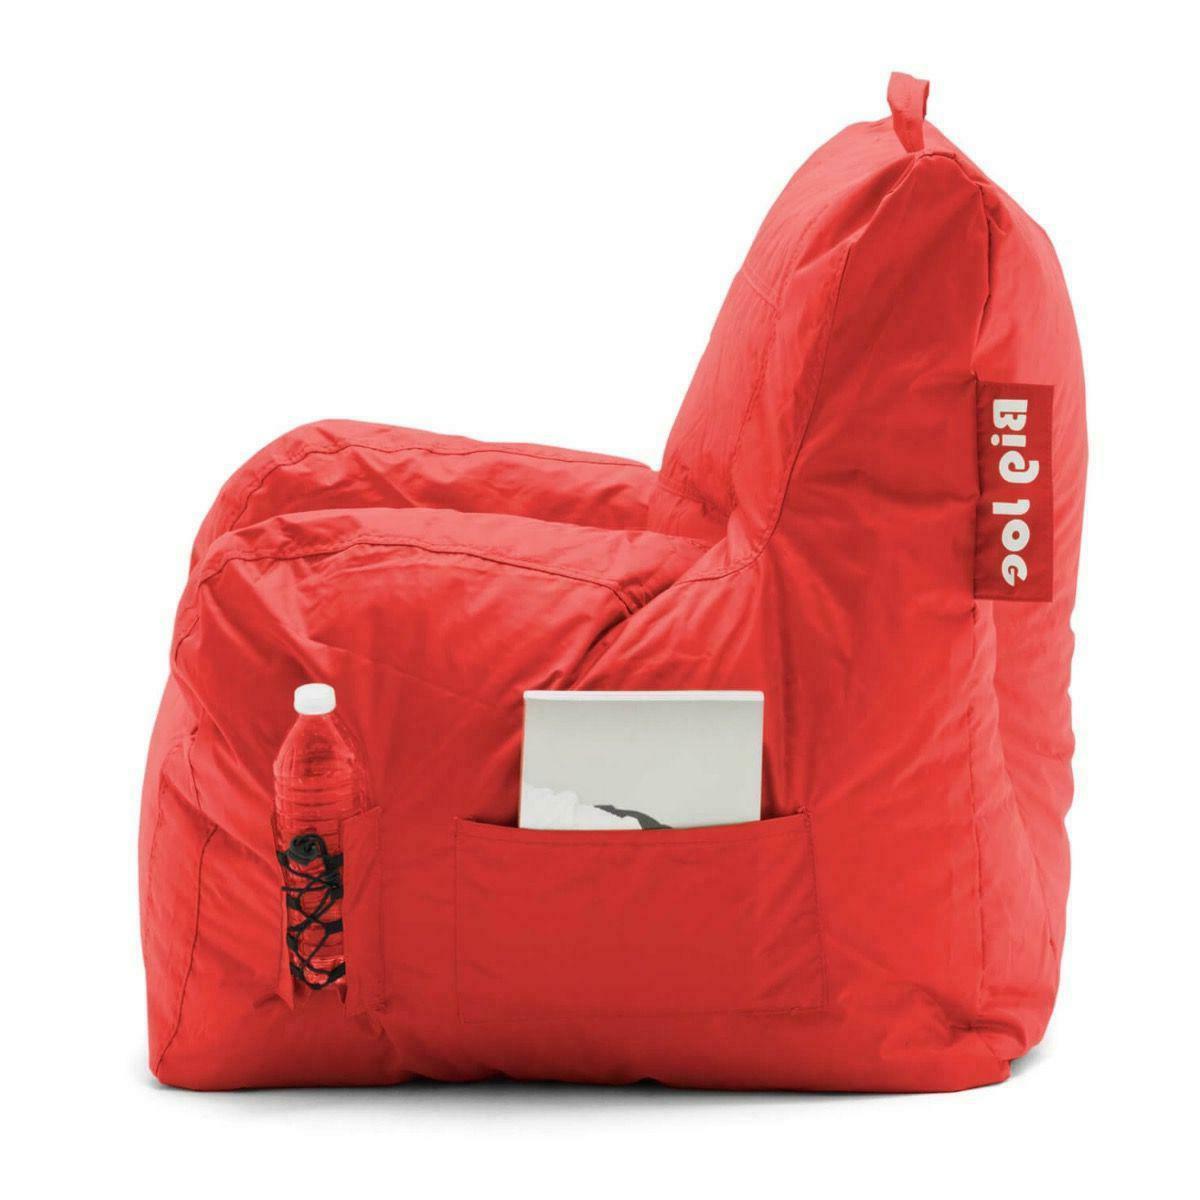 Chair Comfort Waterproof Kids Adults